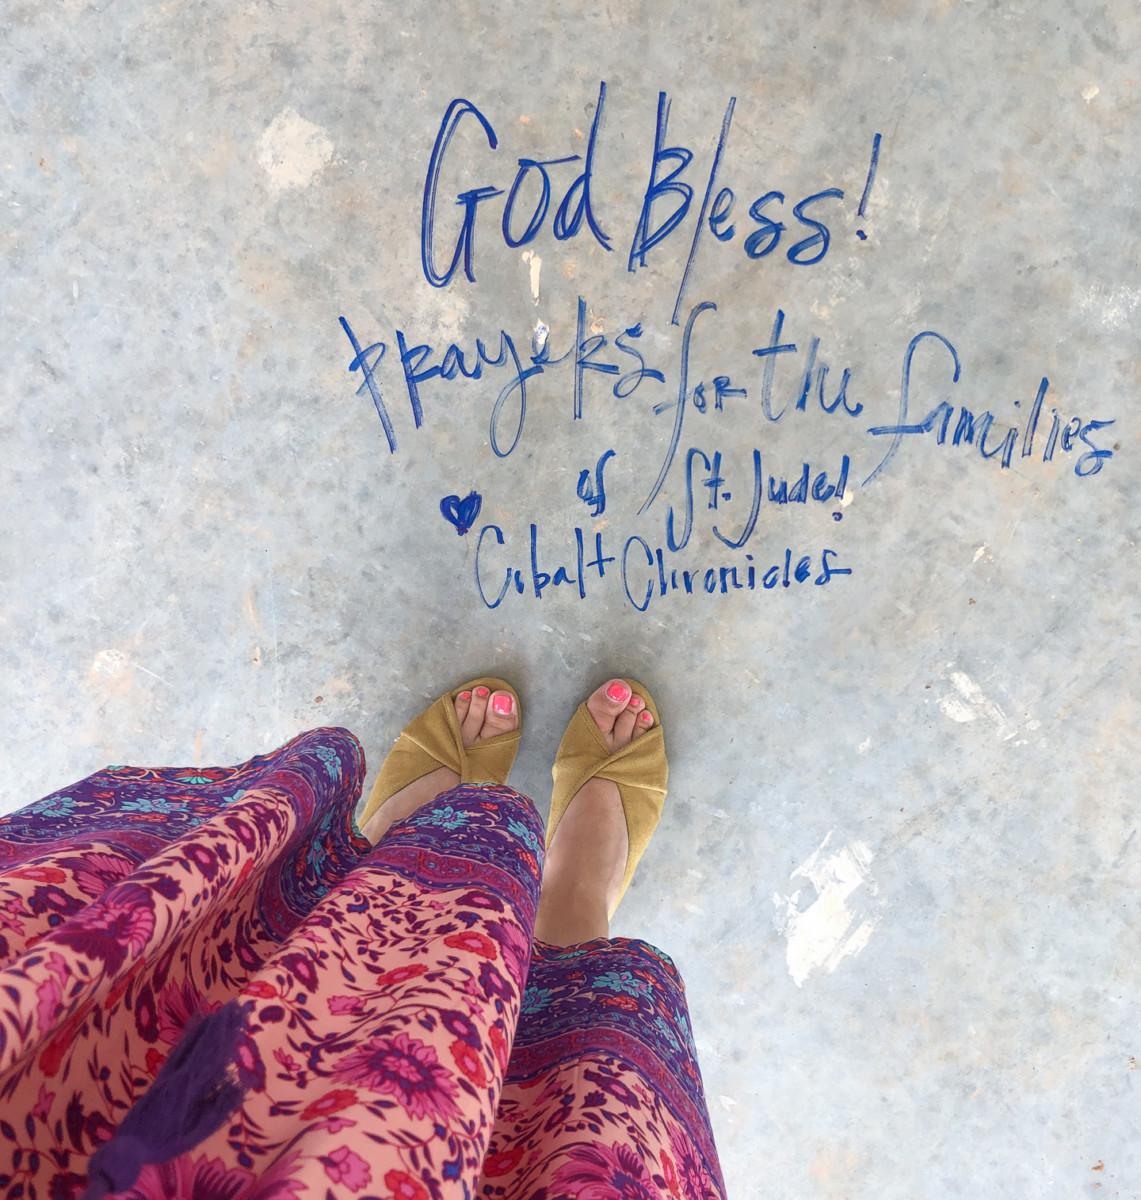 KTBS3 / St. Jude Dream Home Giveaway | Cobalt Chronicles | Shreveport, Louisiana | Louisiana Blogger